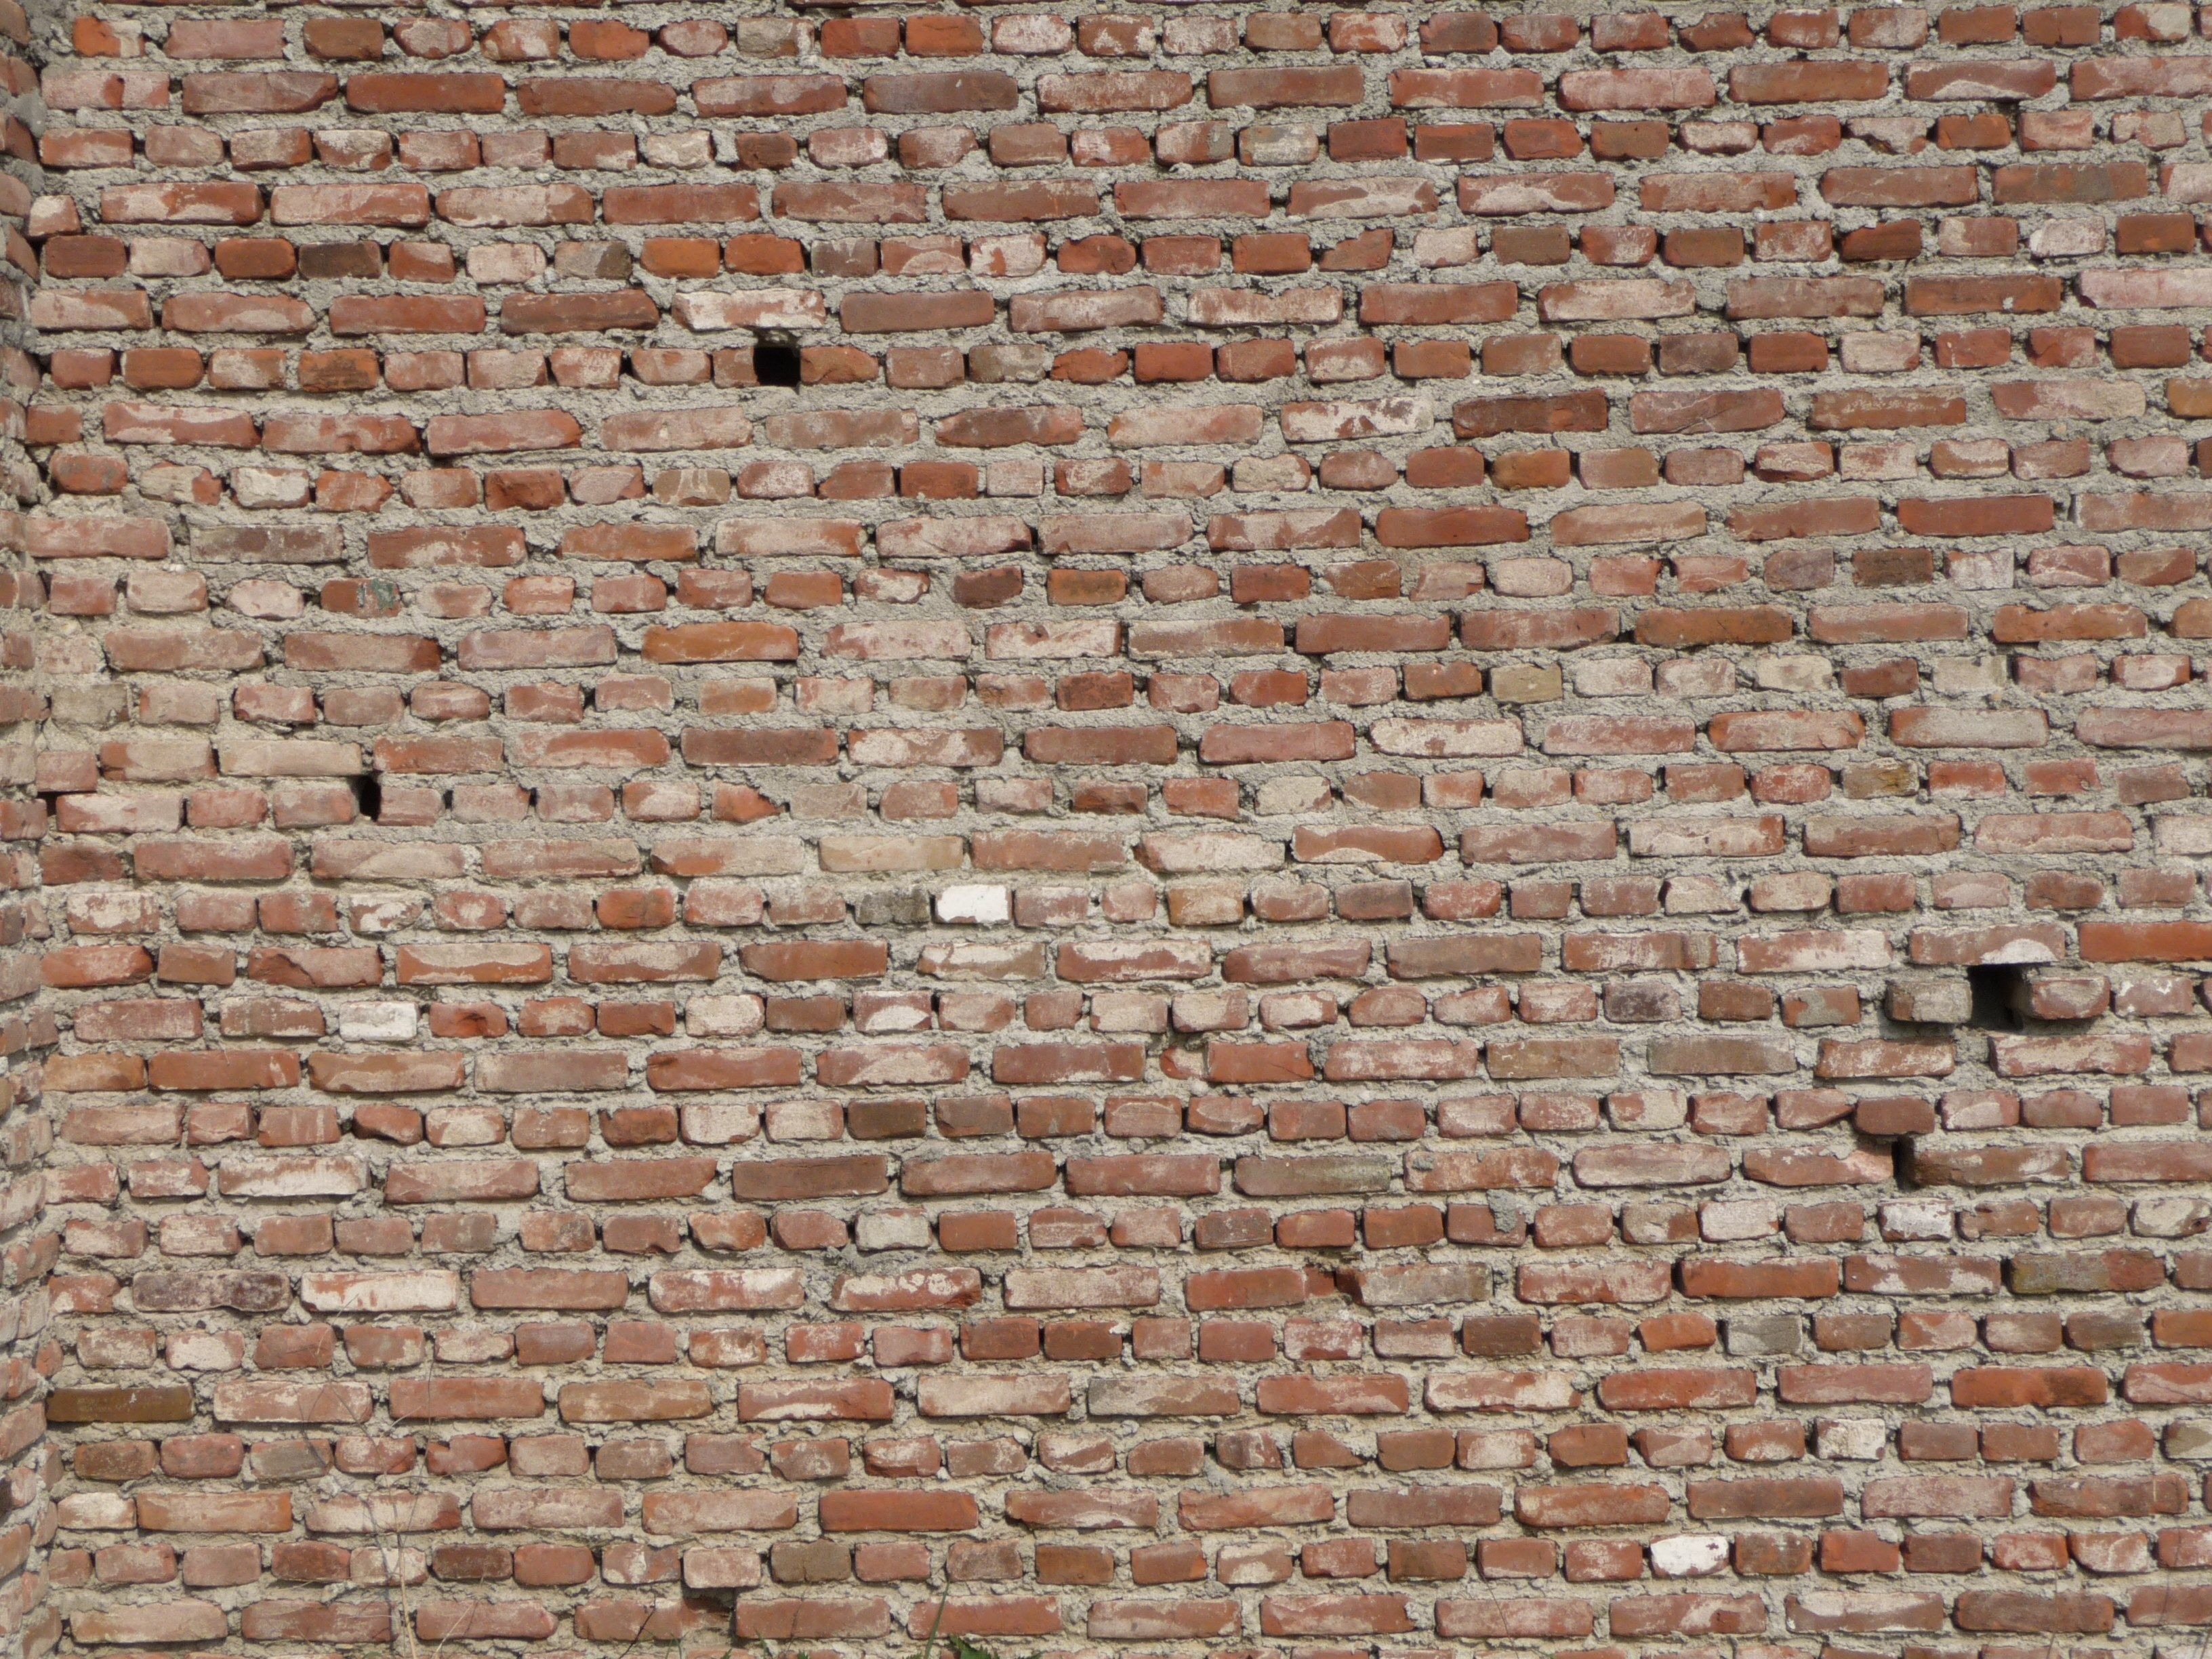 Download 3d Brick Backgrounds Brick Wall Wallpaper Brick Wallpaper Brick Images